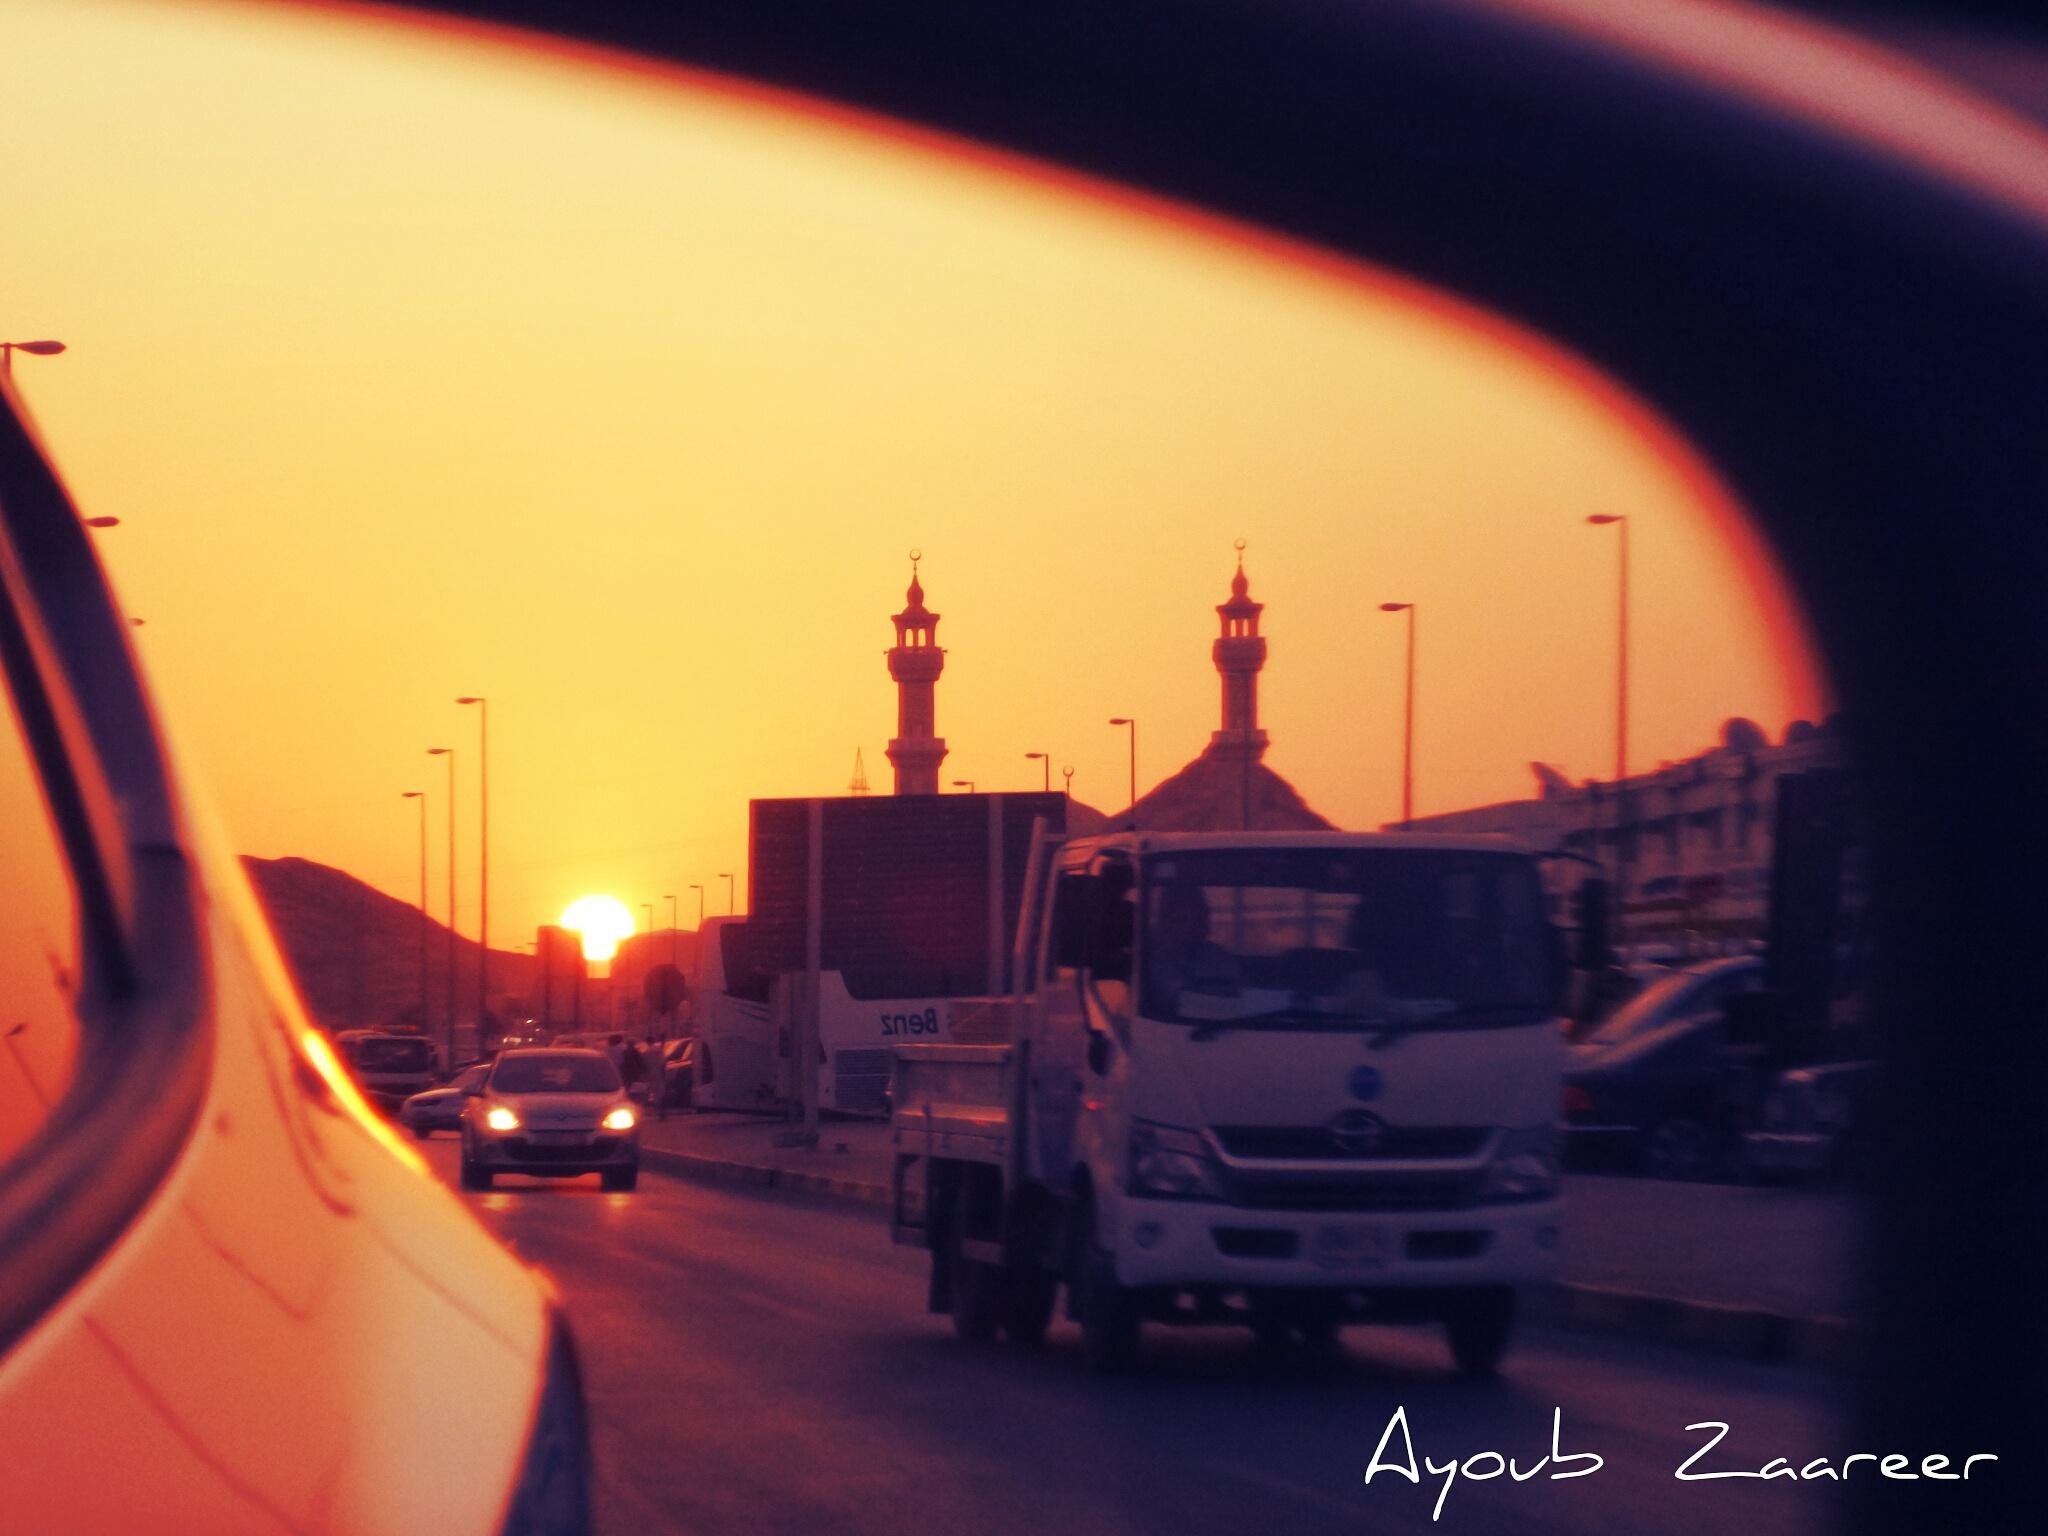 Untitled by Ayoub Zaareer